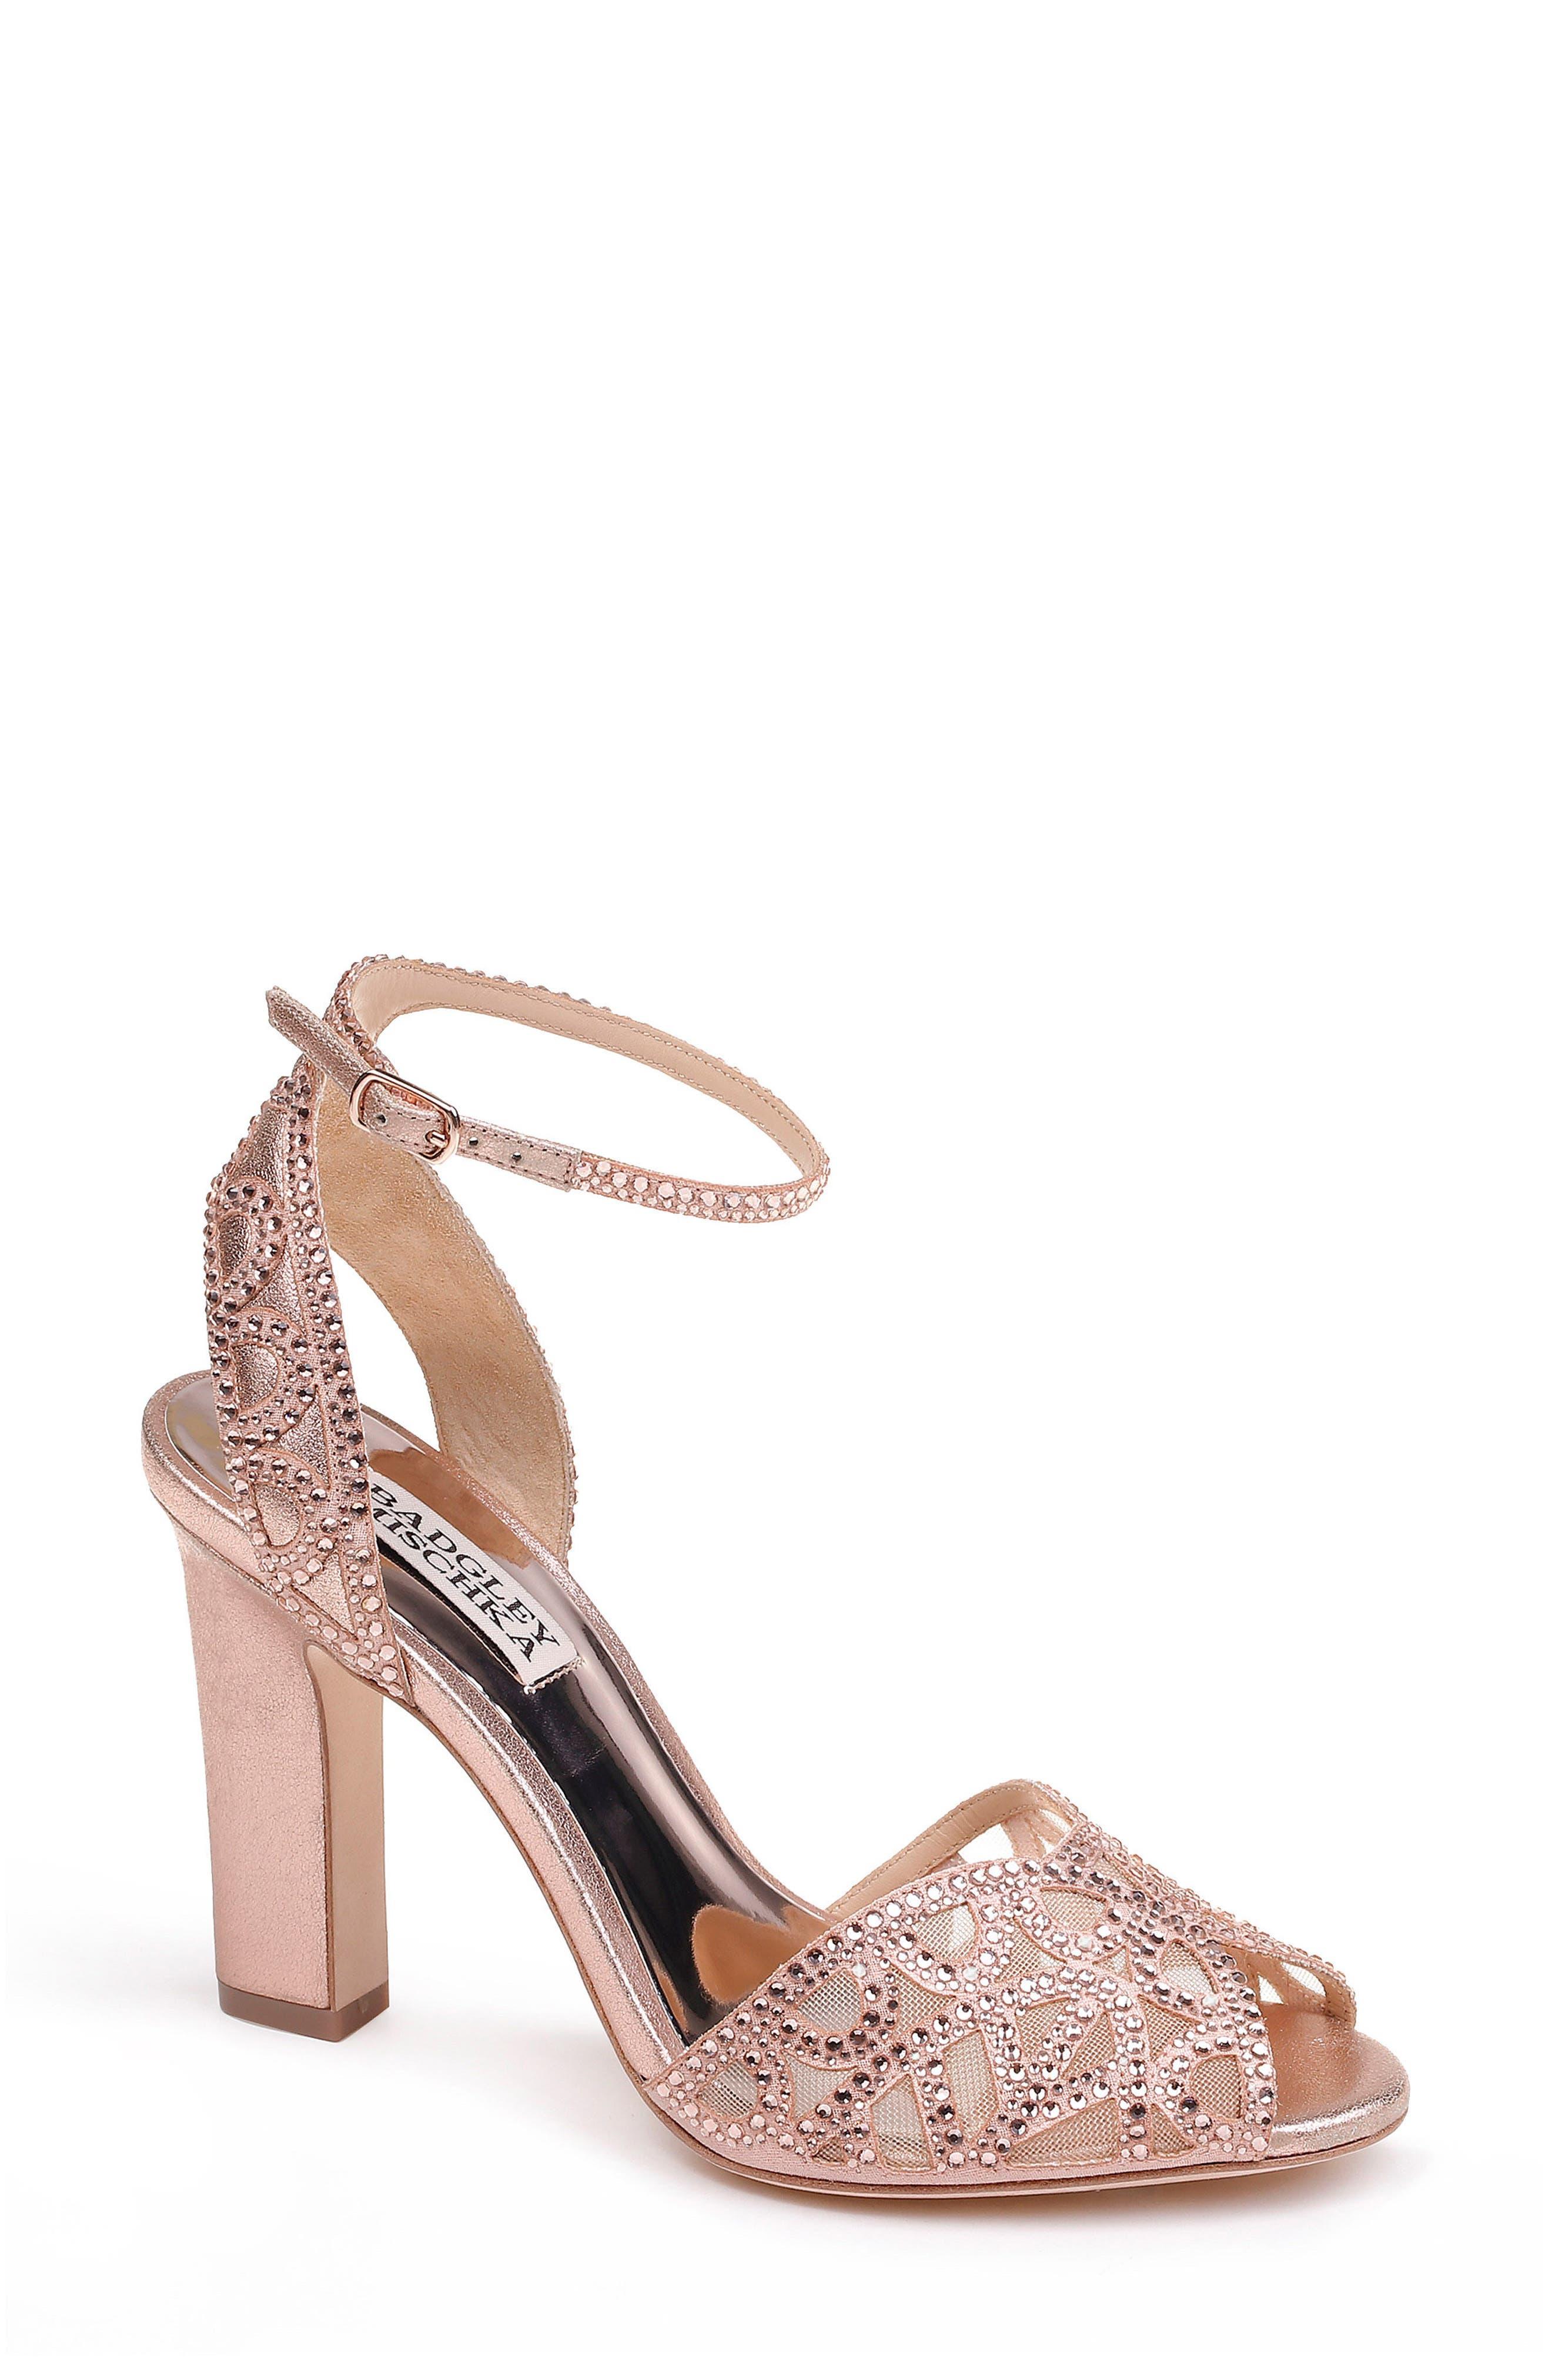 Hart Crystal Embellished Sandal,                             Main thumbnail 1, color,                             ROSE GOLD METALLIC SUEDE